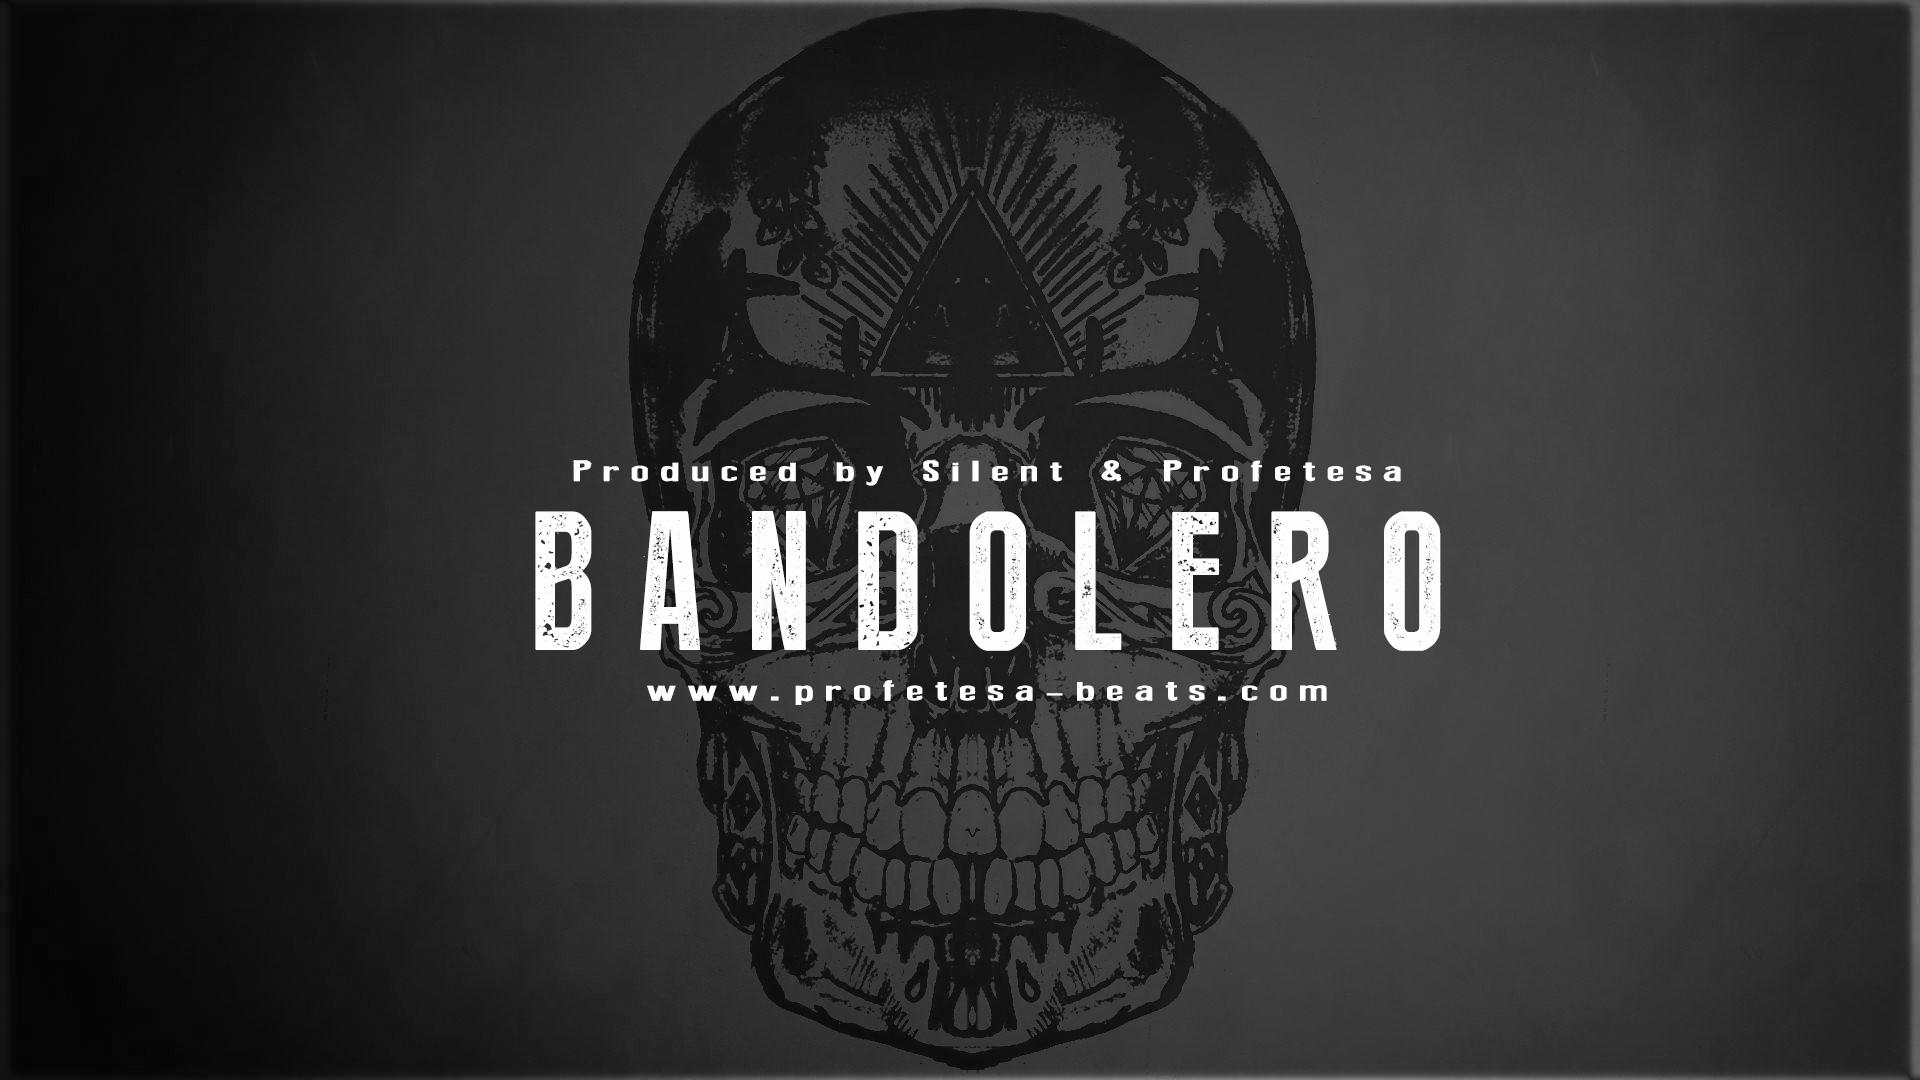 Bandolero feat. Silent